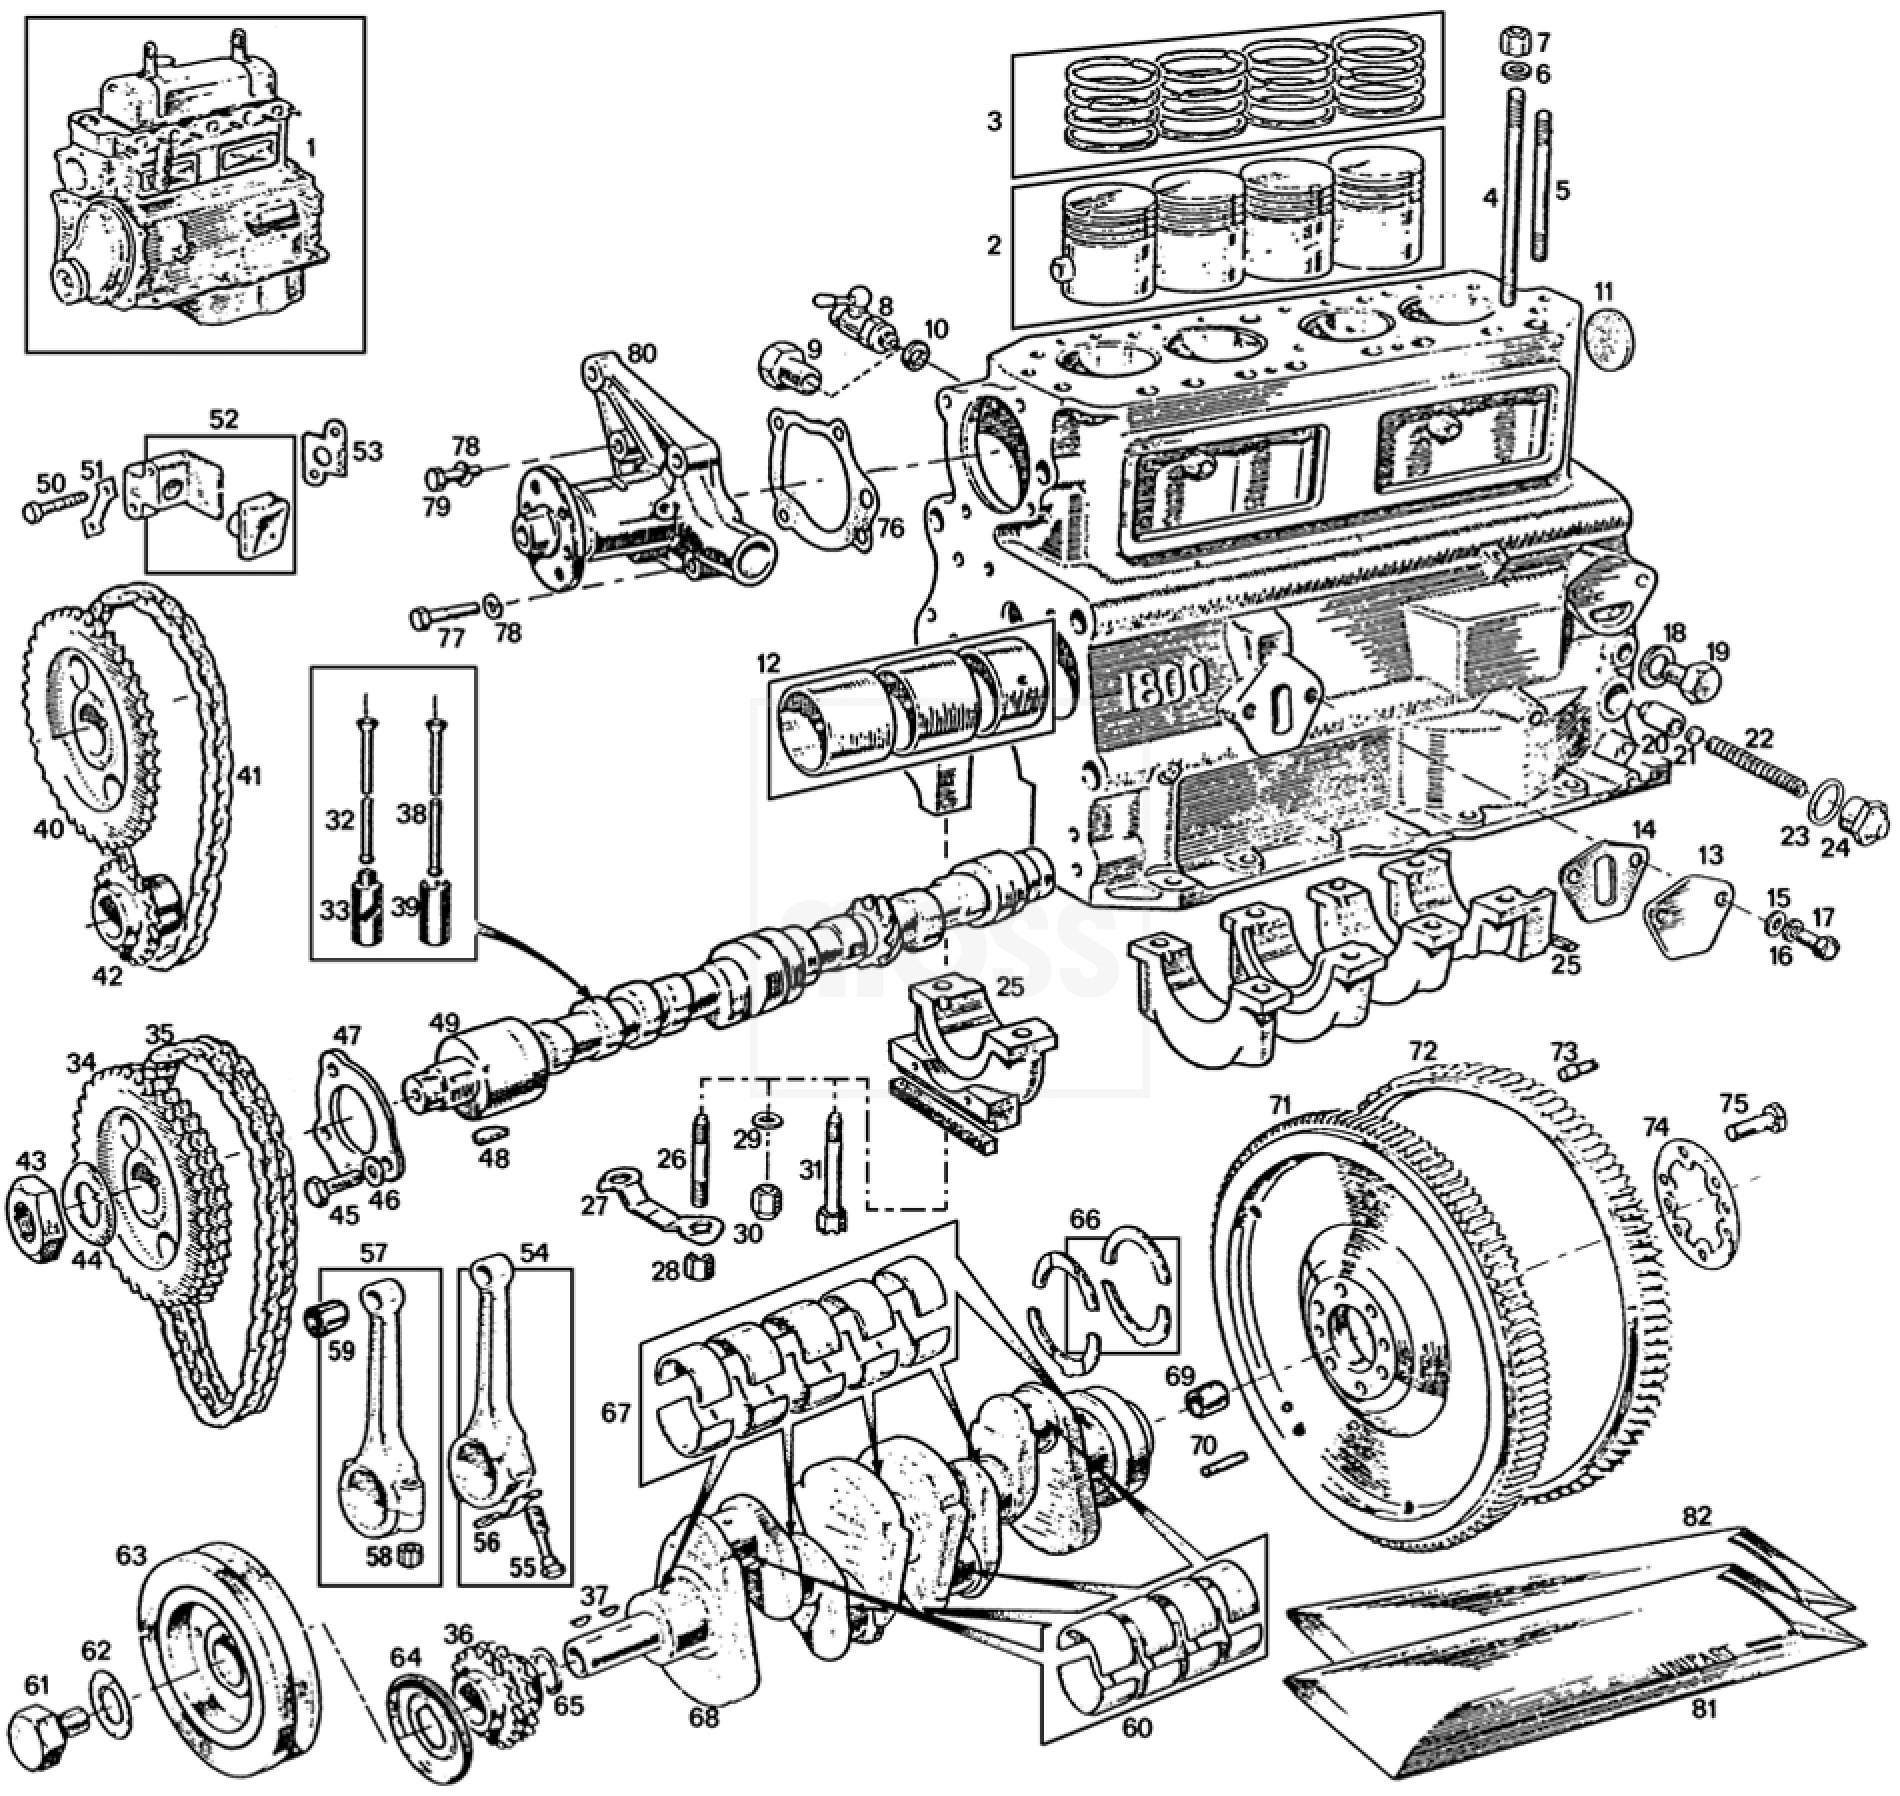 Sch furthermore antique cushman golf car wireing diagram additionally 1989 club car wiring diagram furthermore 319403798544696755